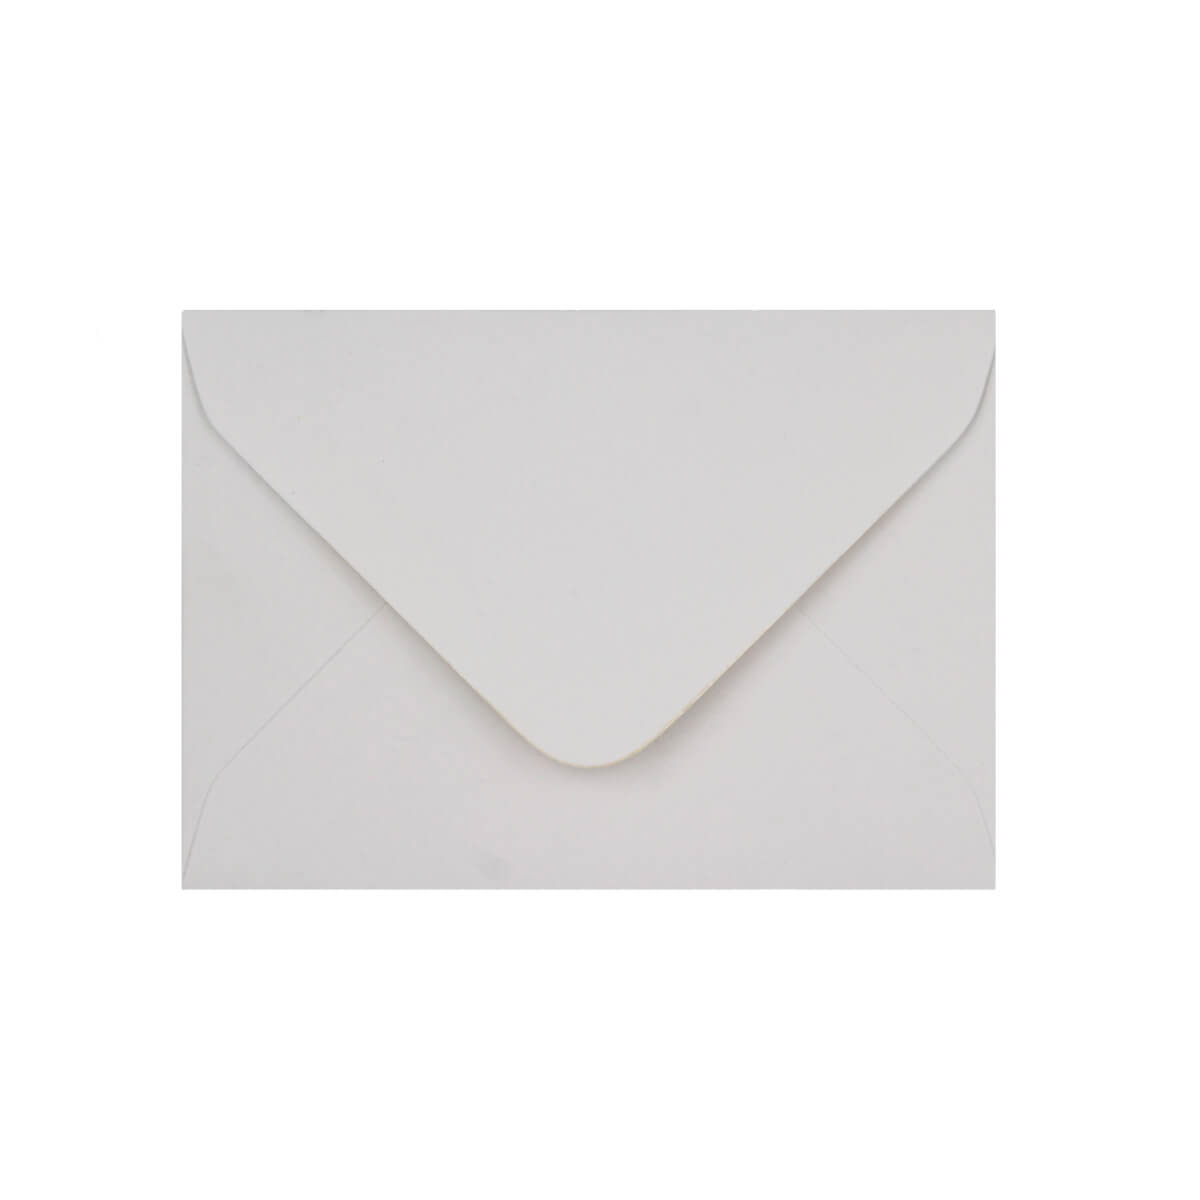 WHITE 70 x 100mm GIFT TAG ENVELOPE 130GSM (i2)